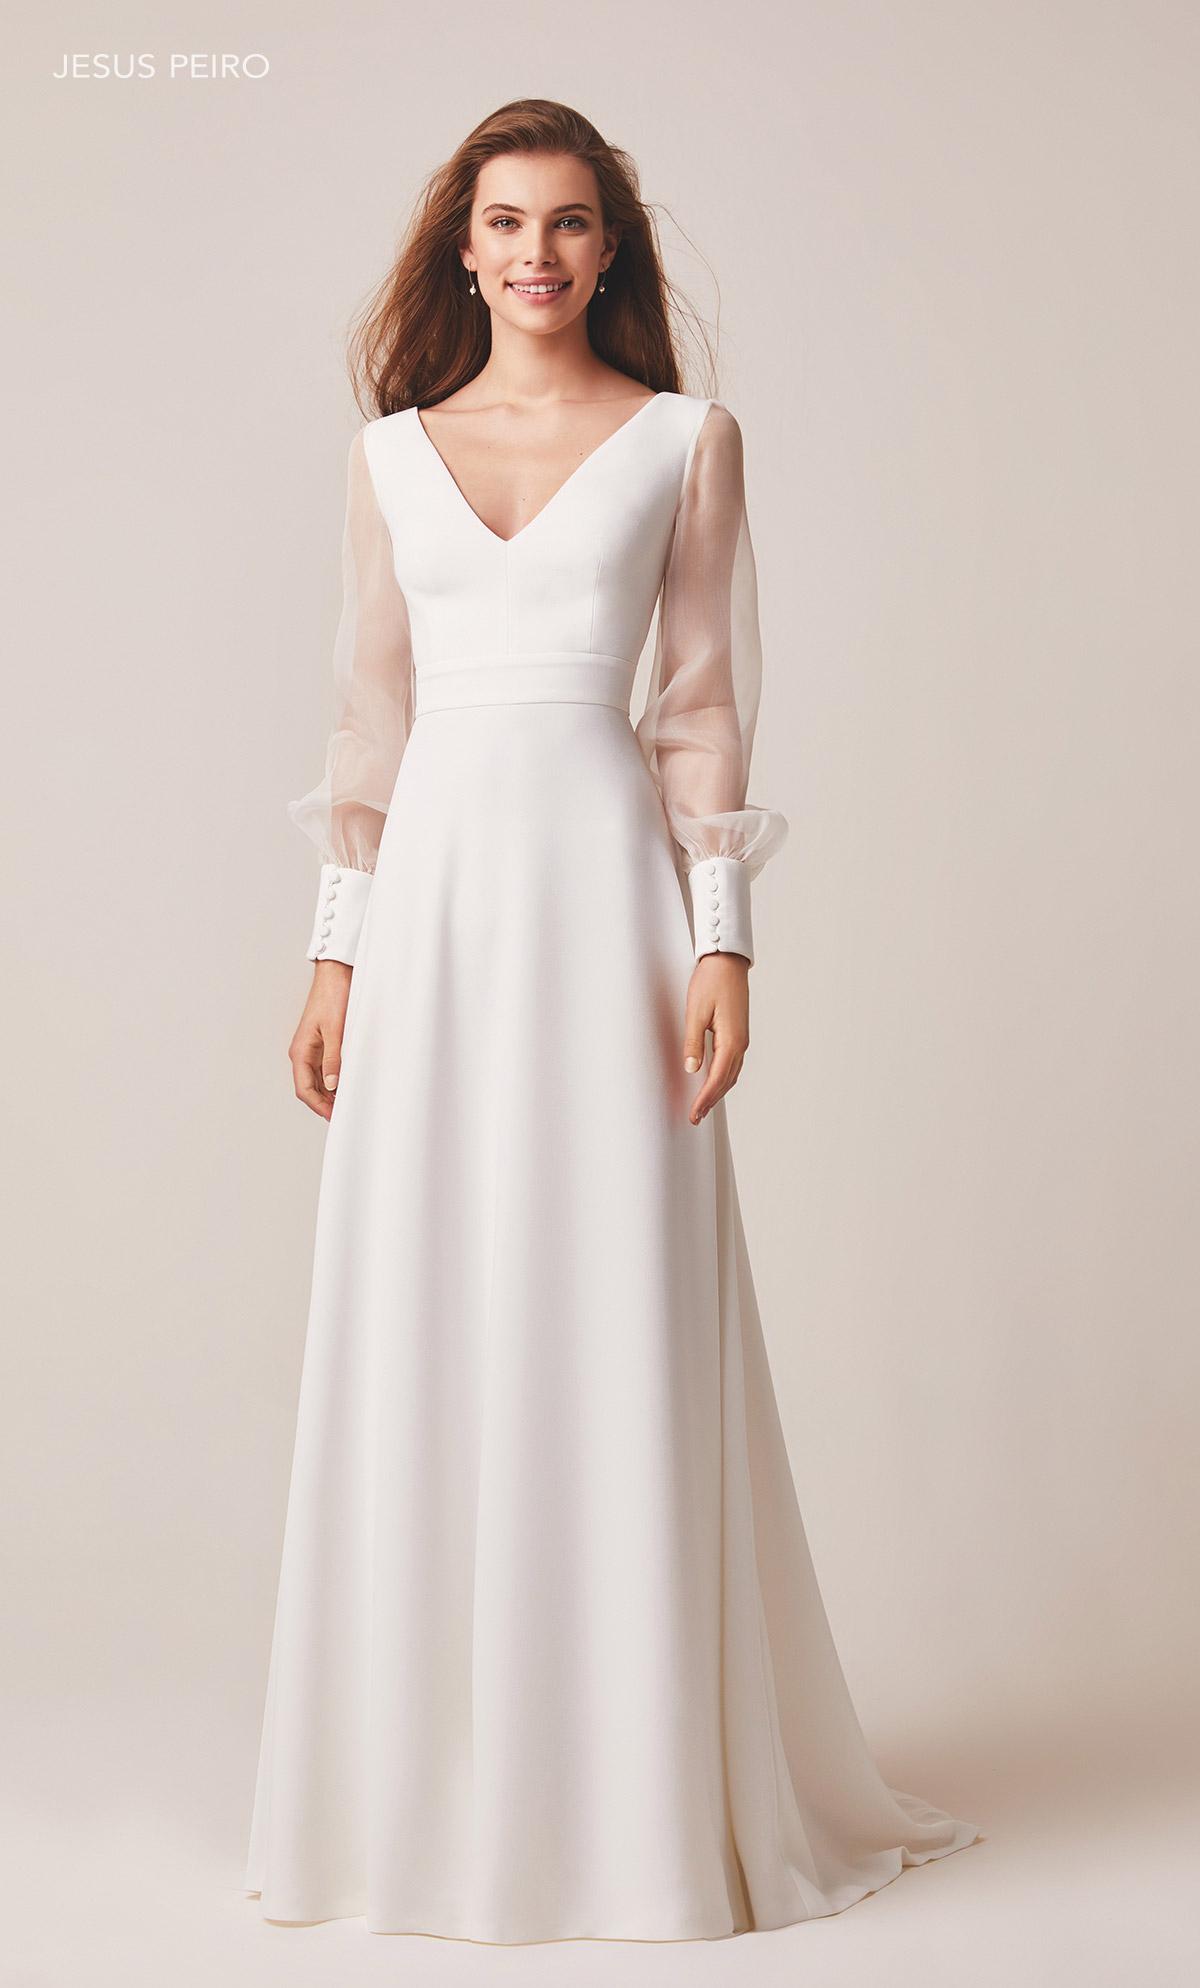 Vestido novia Jesús Peiró Ref.120